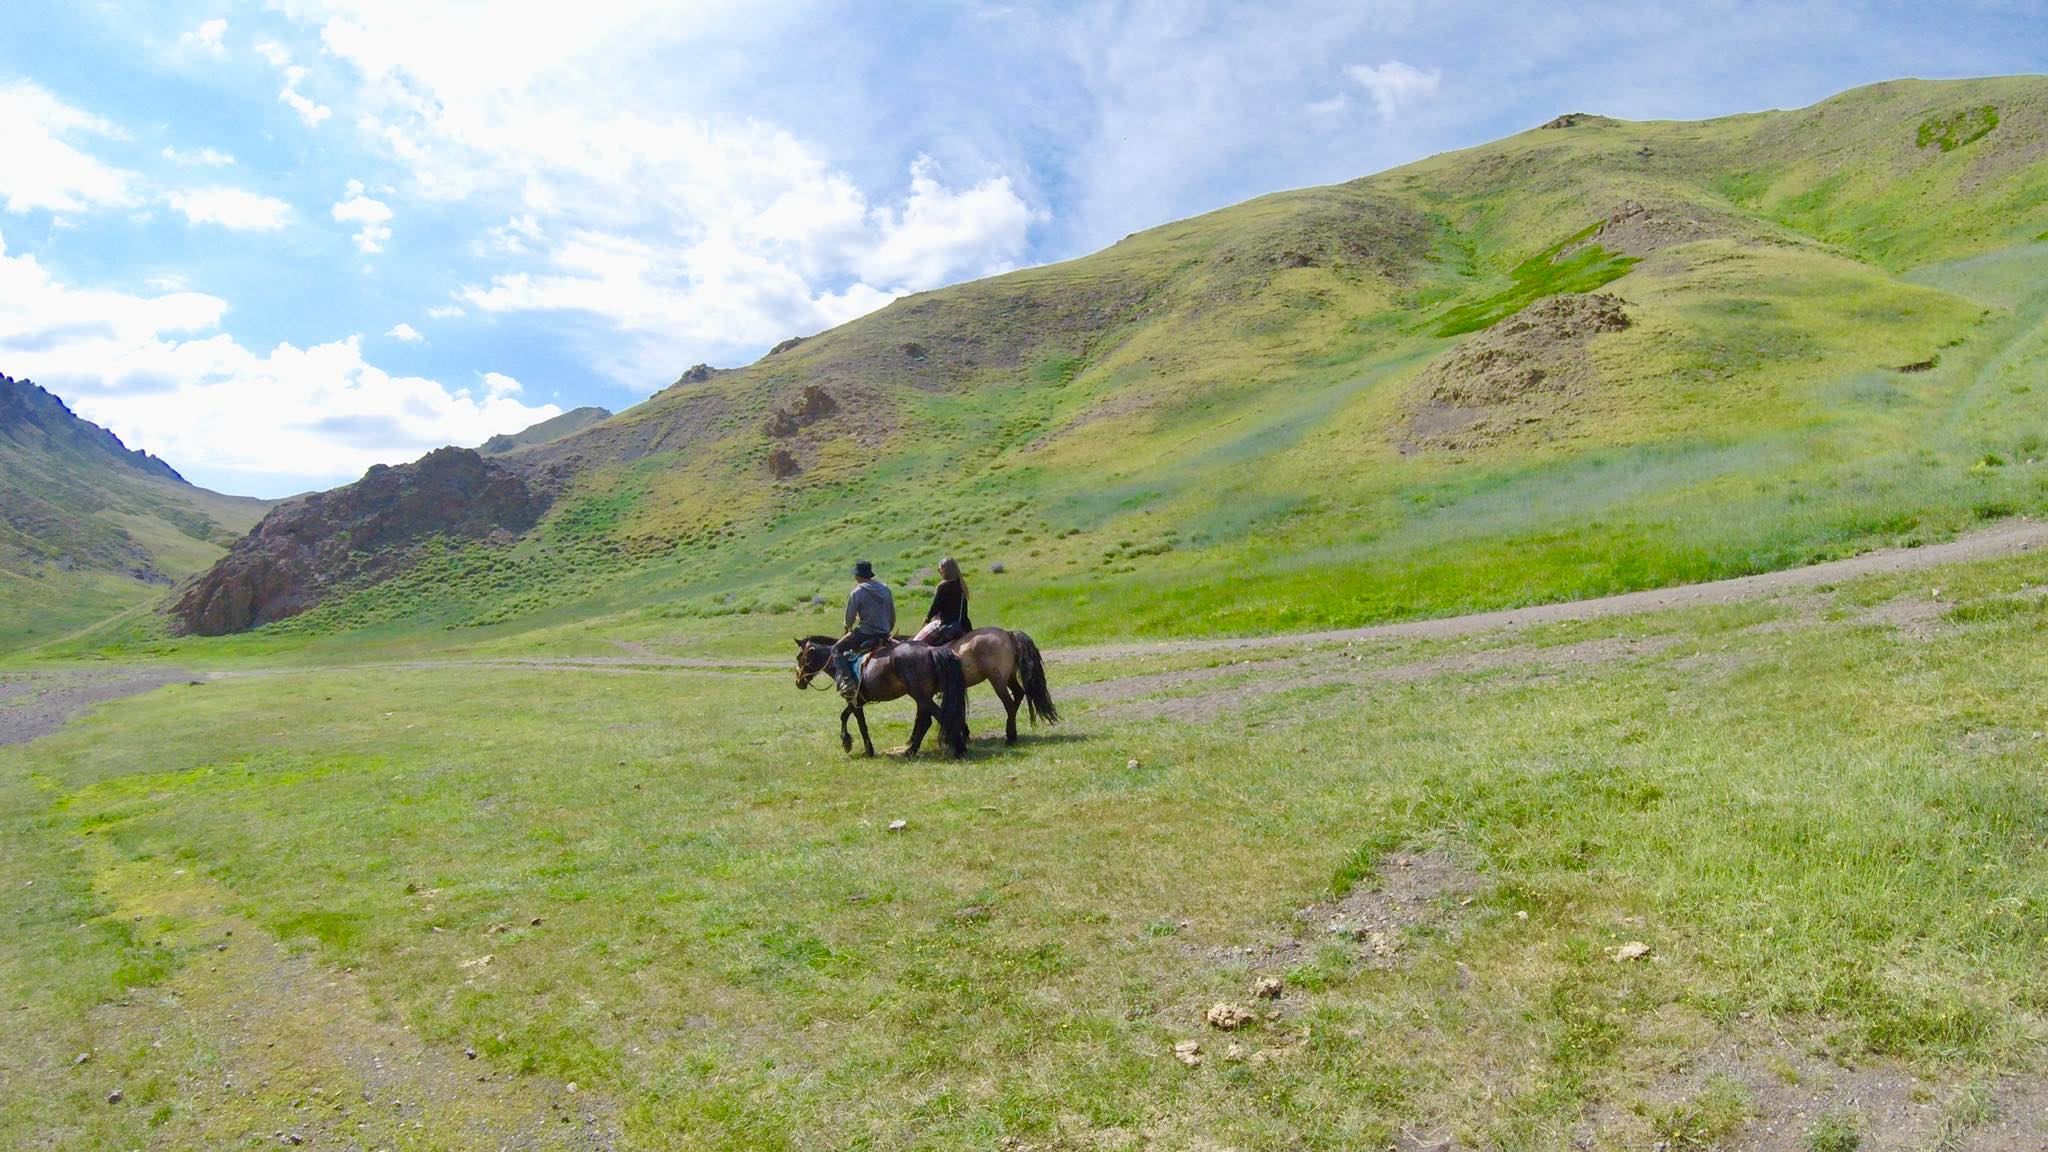 Kach Solo Travels in 2019 Horseback riding trip to the Gobi Gurvan Saikhan National Park12.jpg